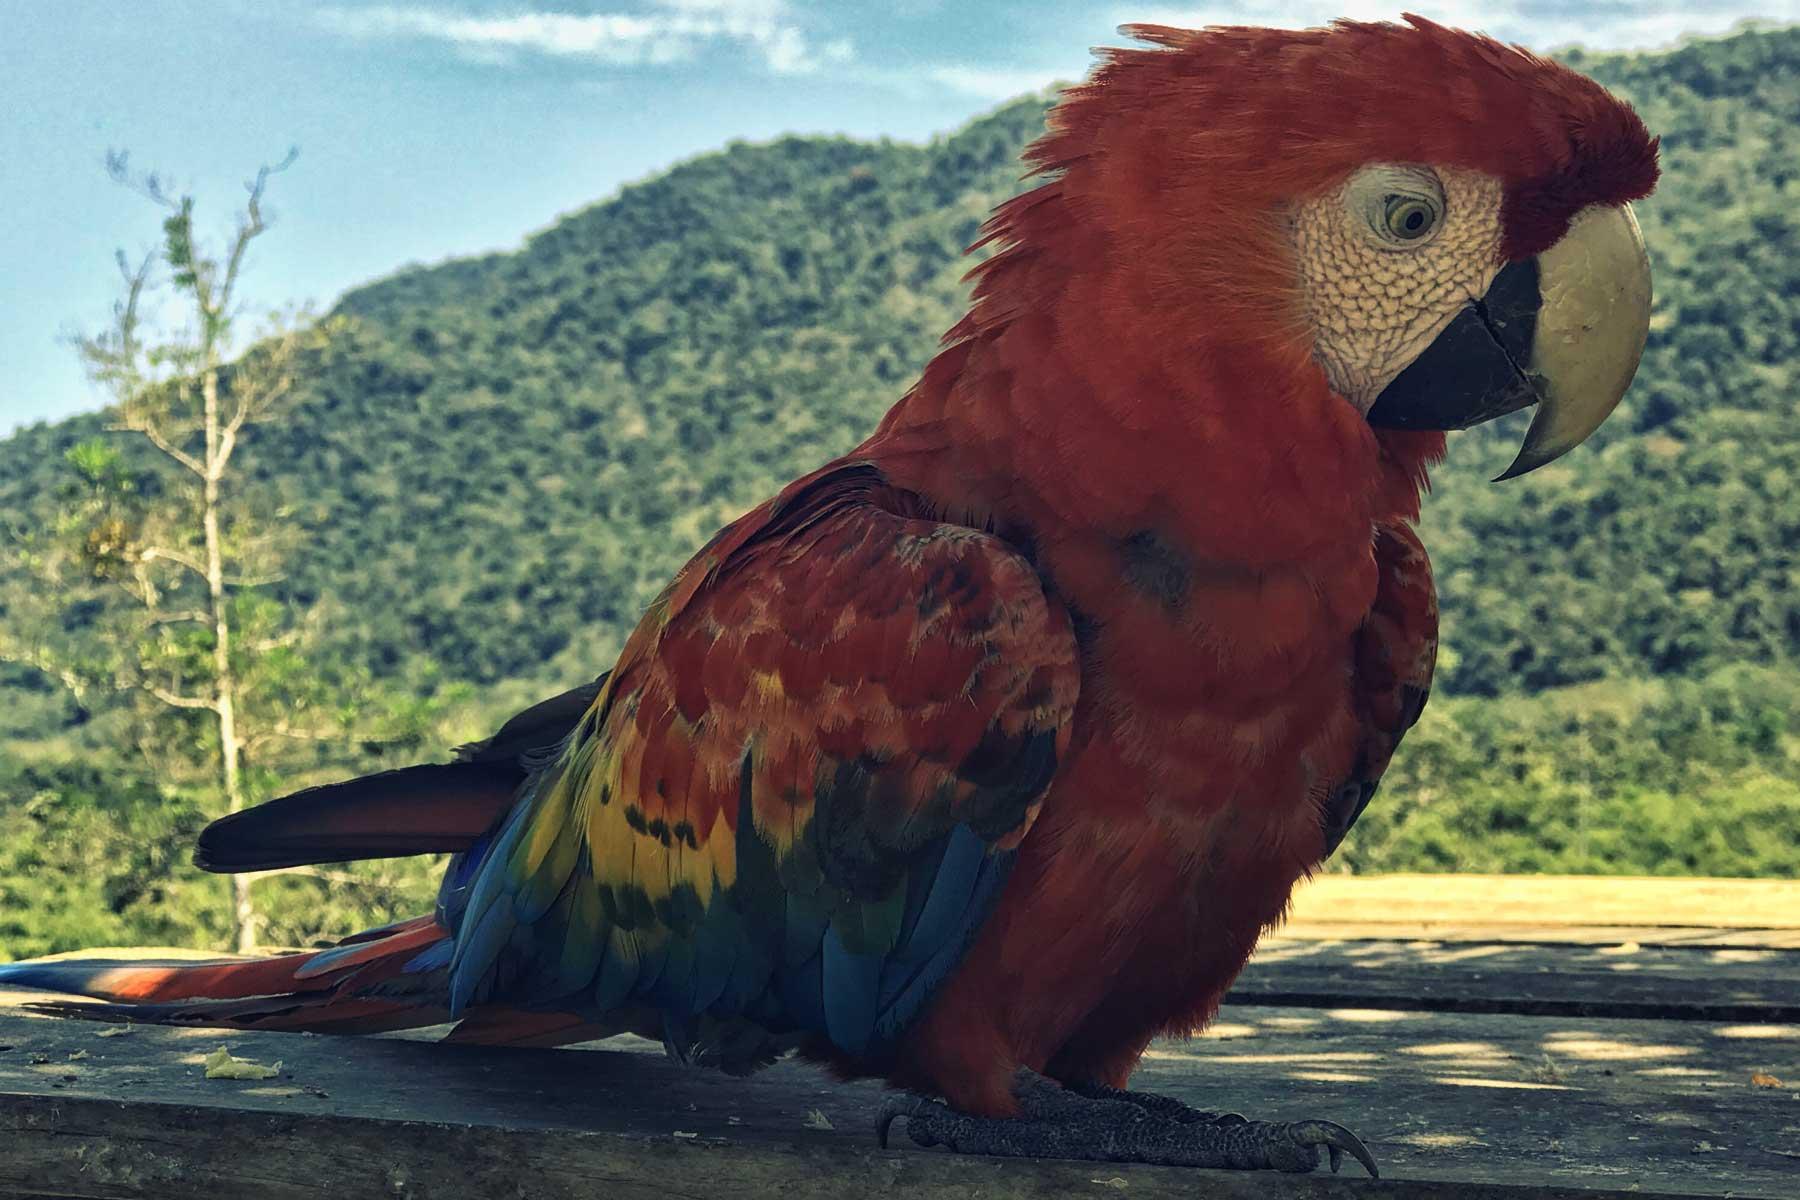 Loro colorido de la selva peruana en Manu